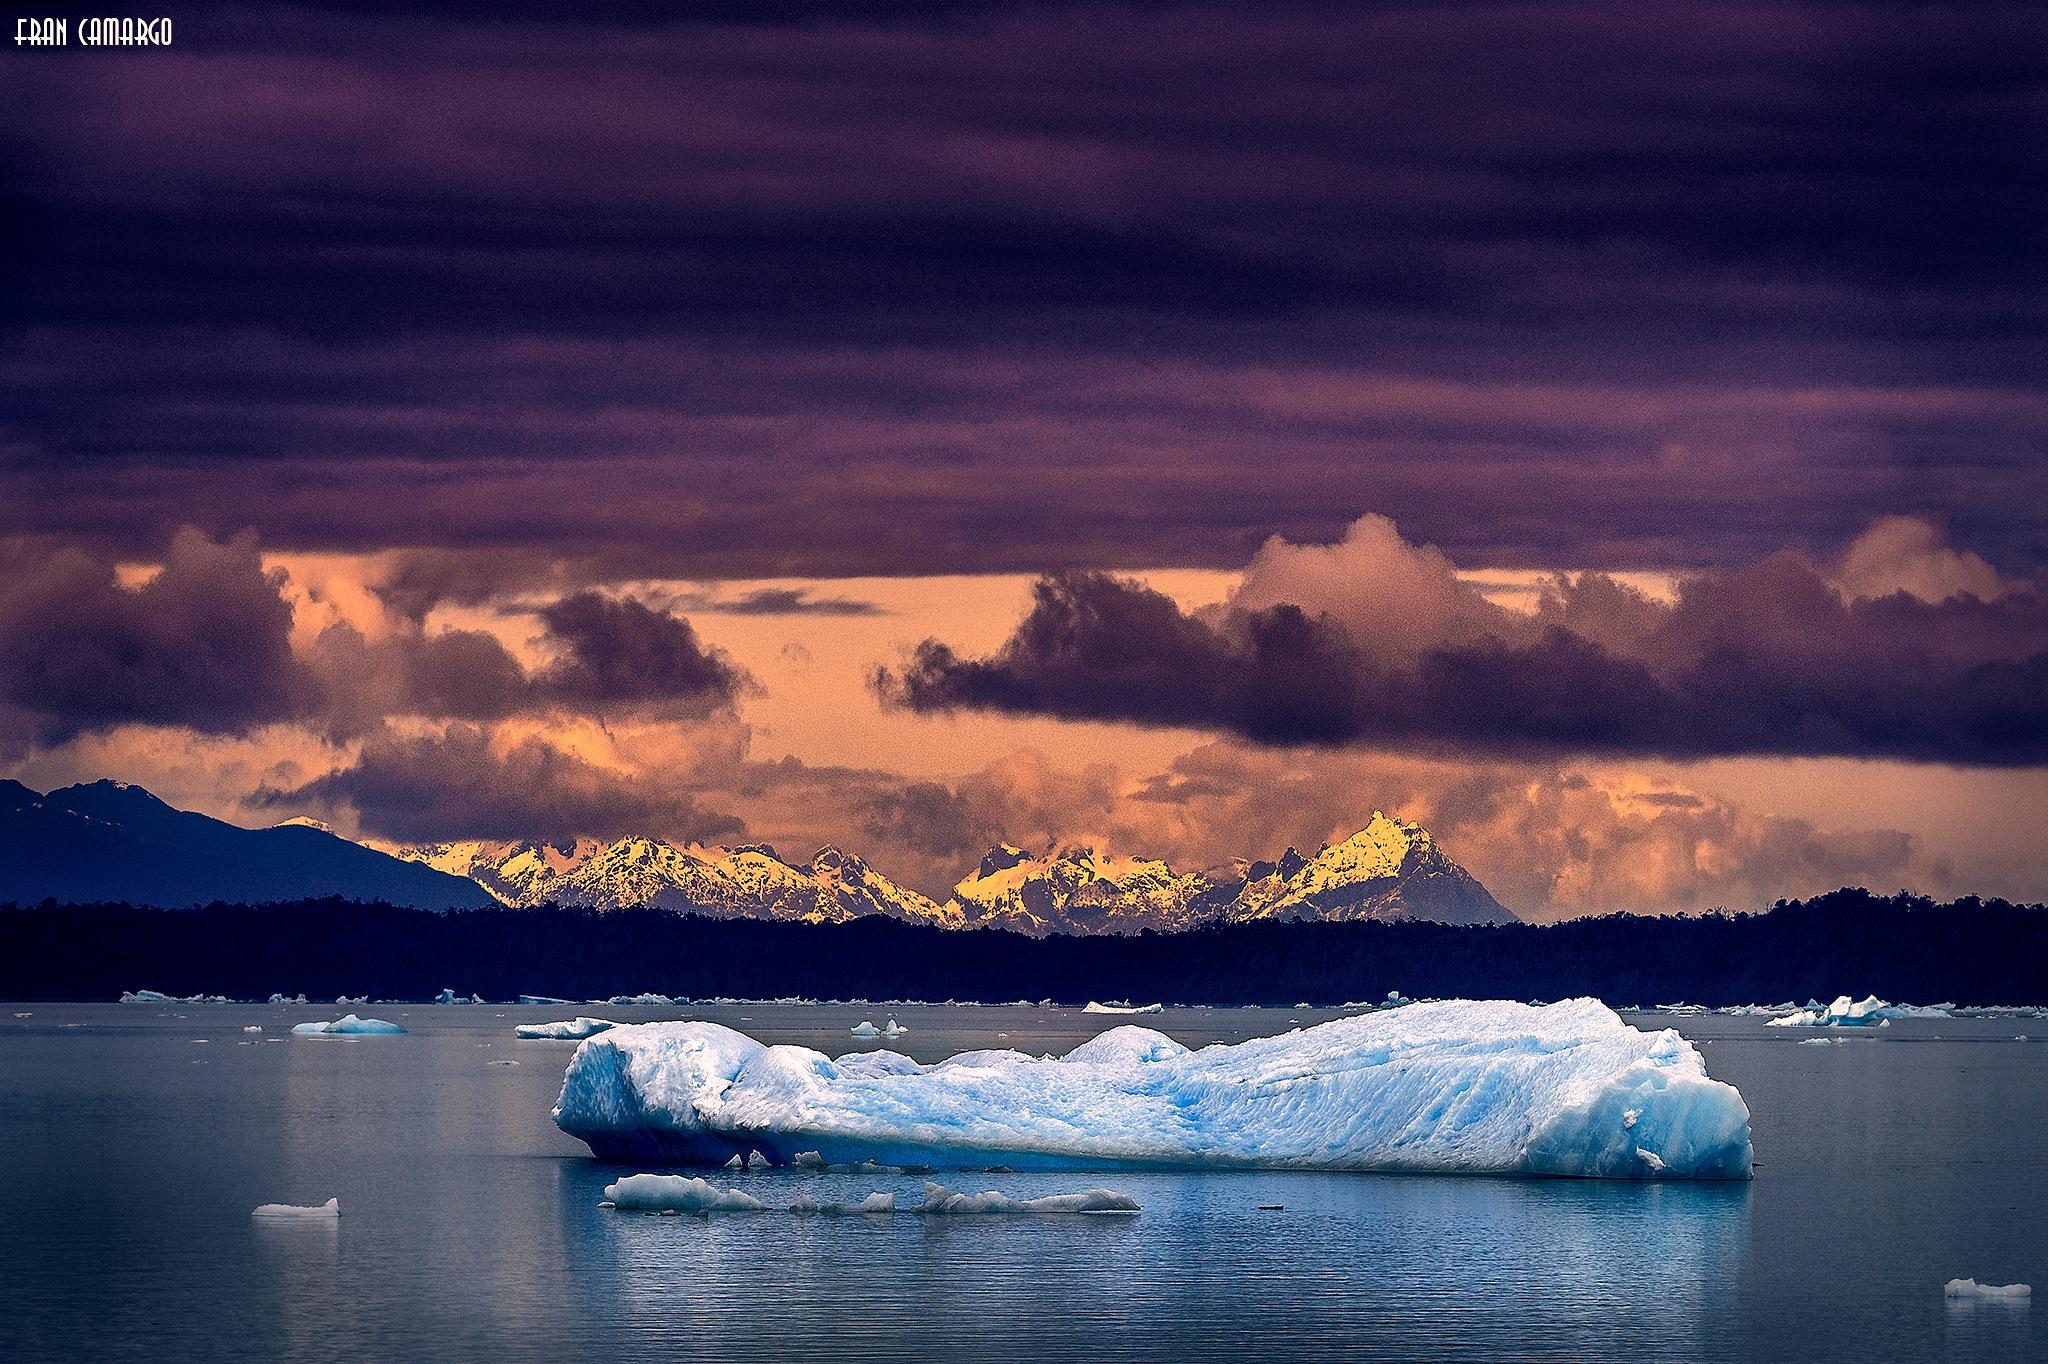 Patagonia - Argentina by Fran Camargo